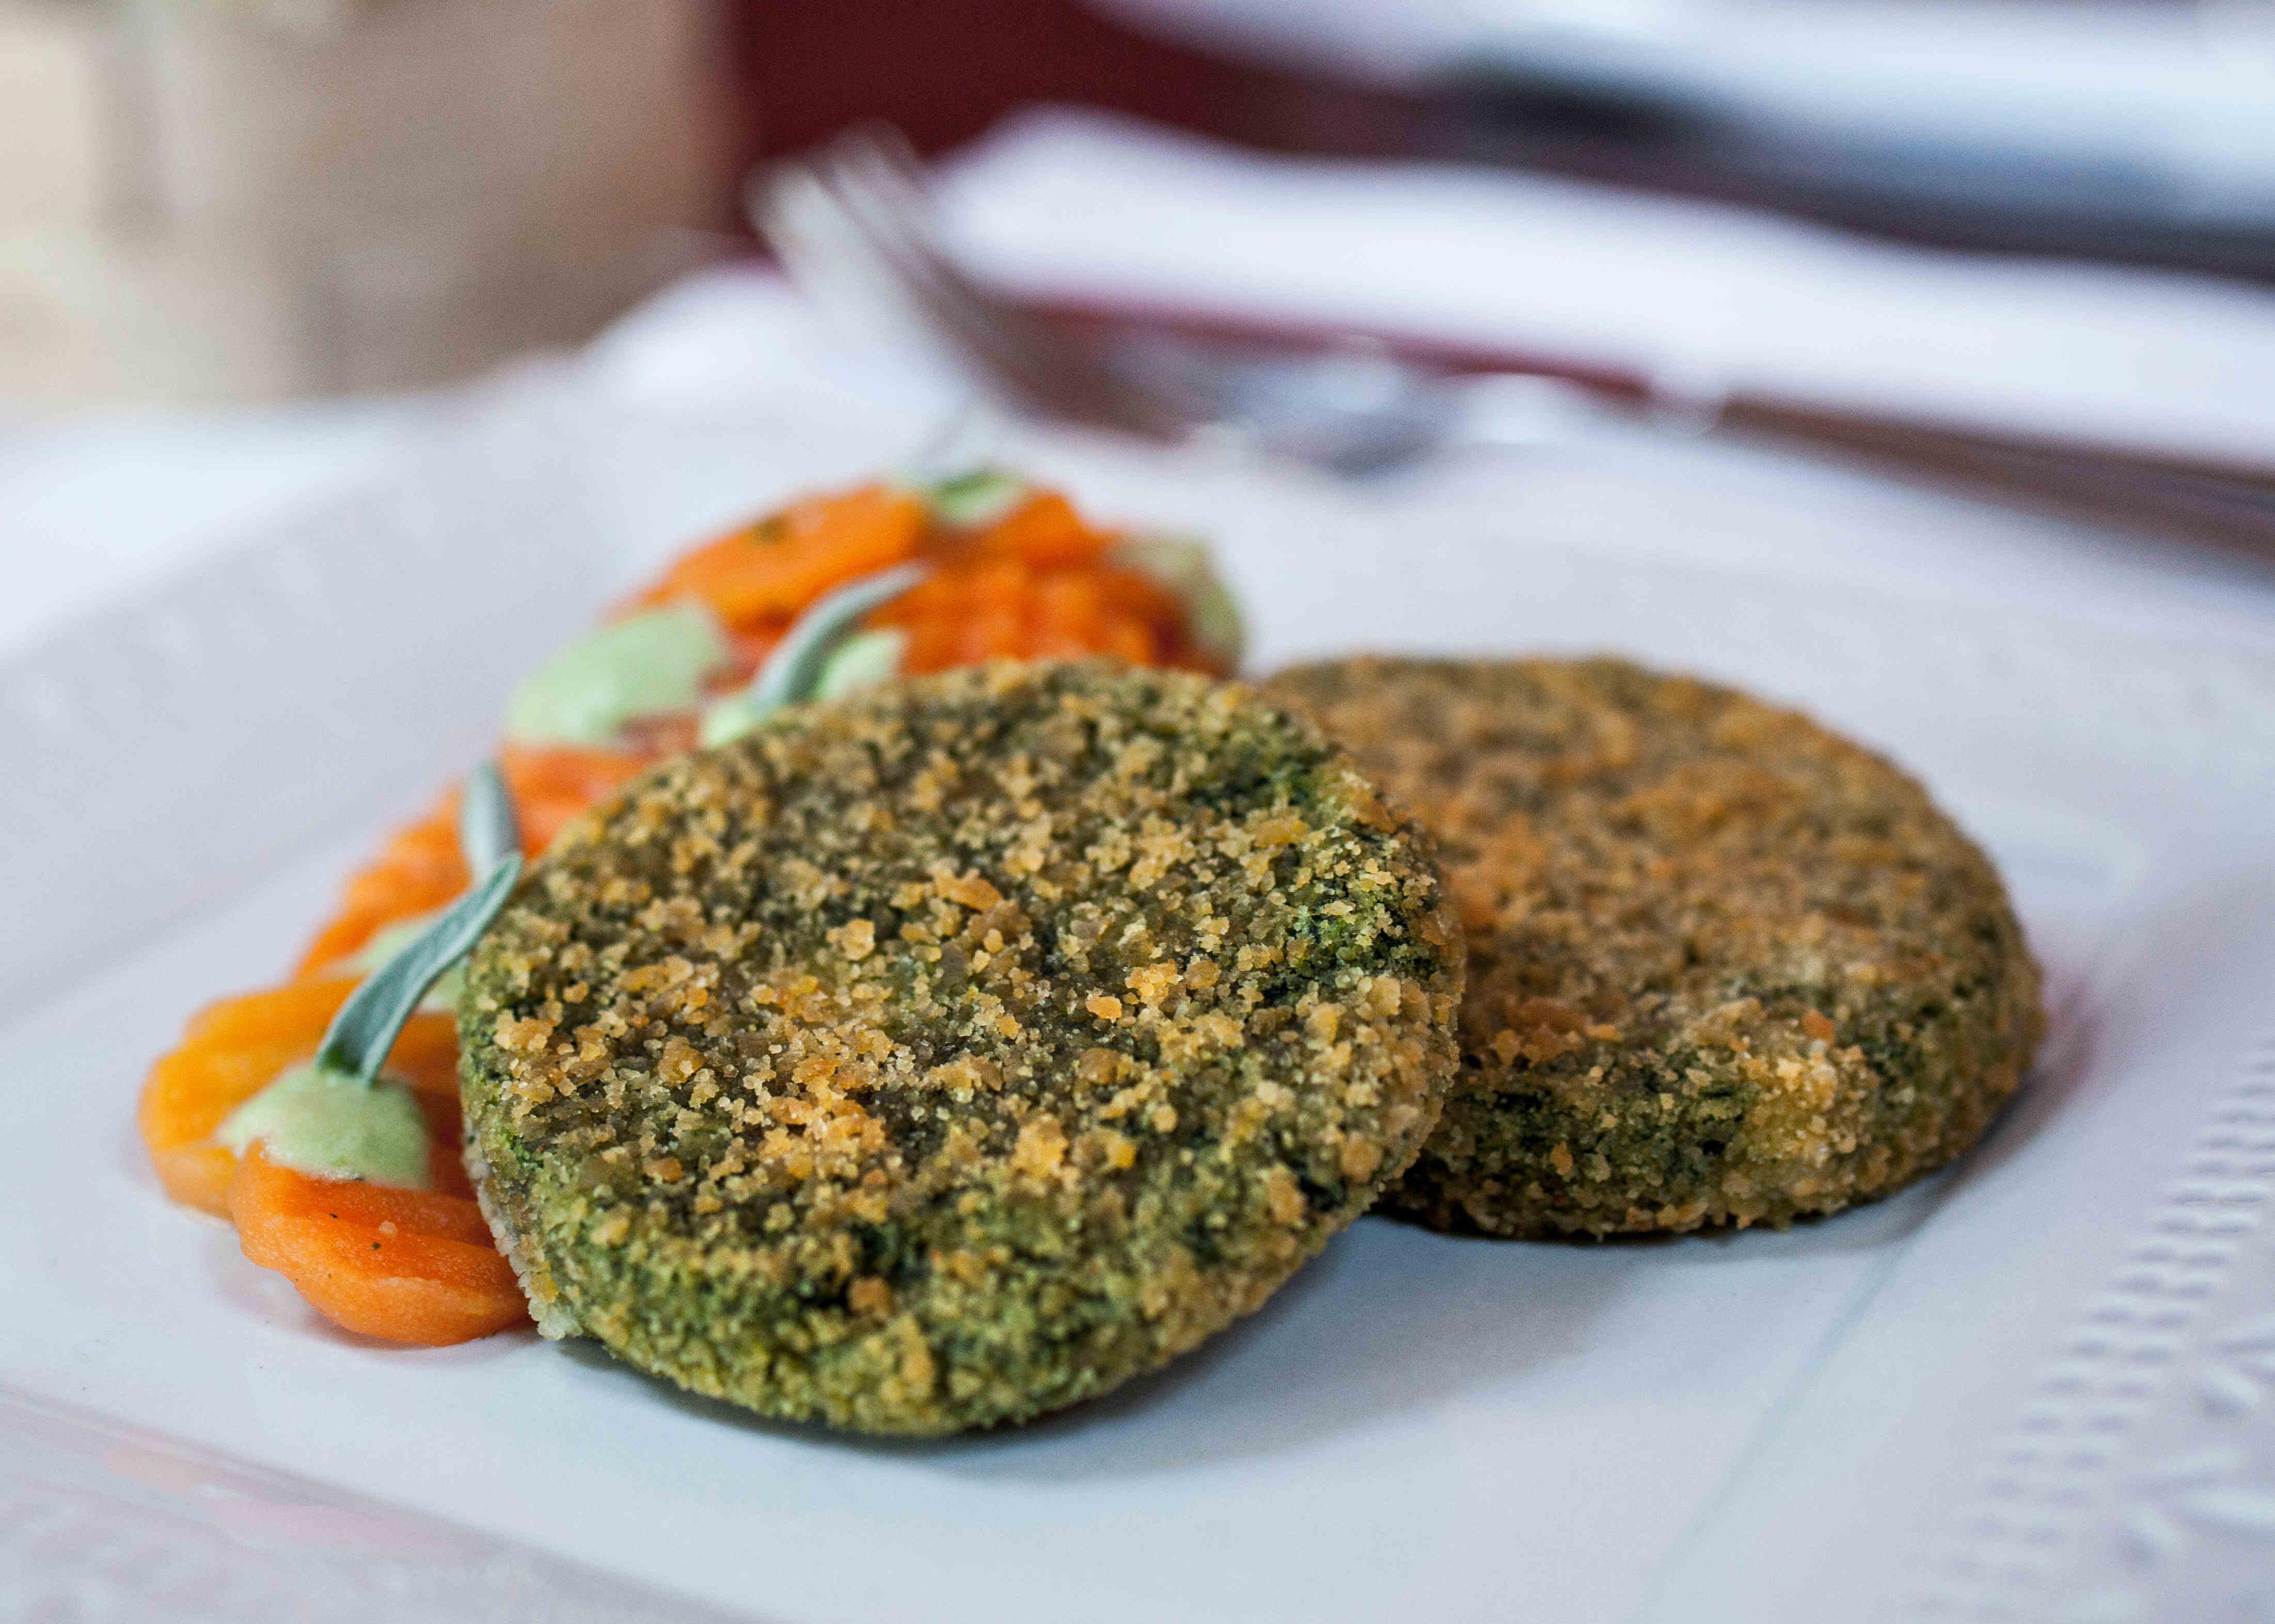 Orogel - Informazione pubblicitaria - Mini burger vegetariani per tutti!